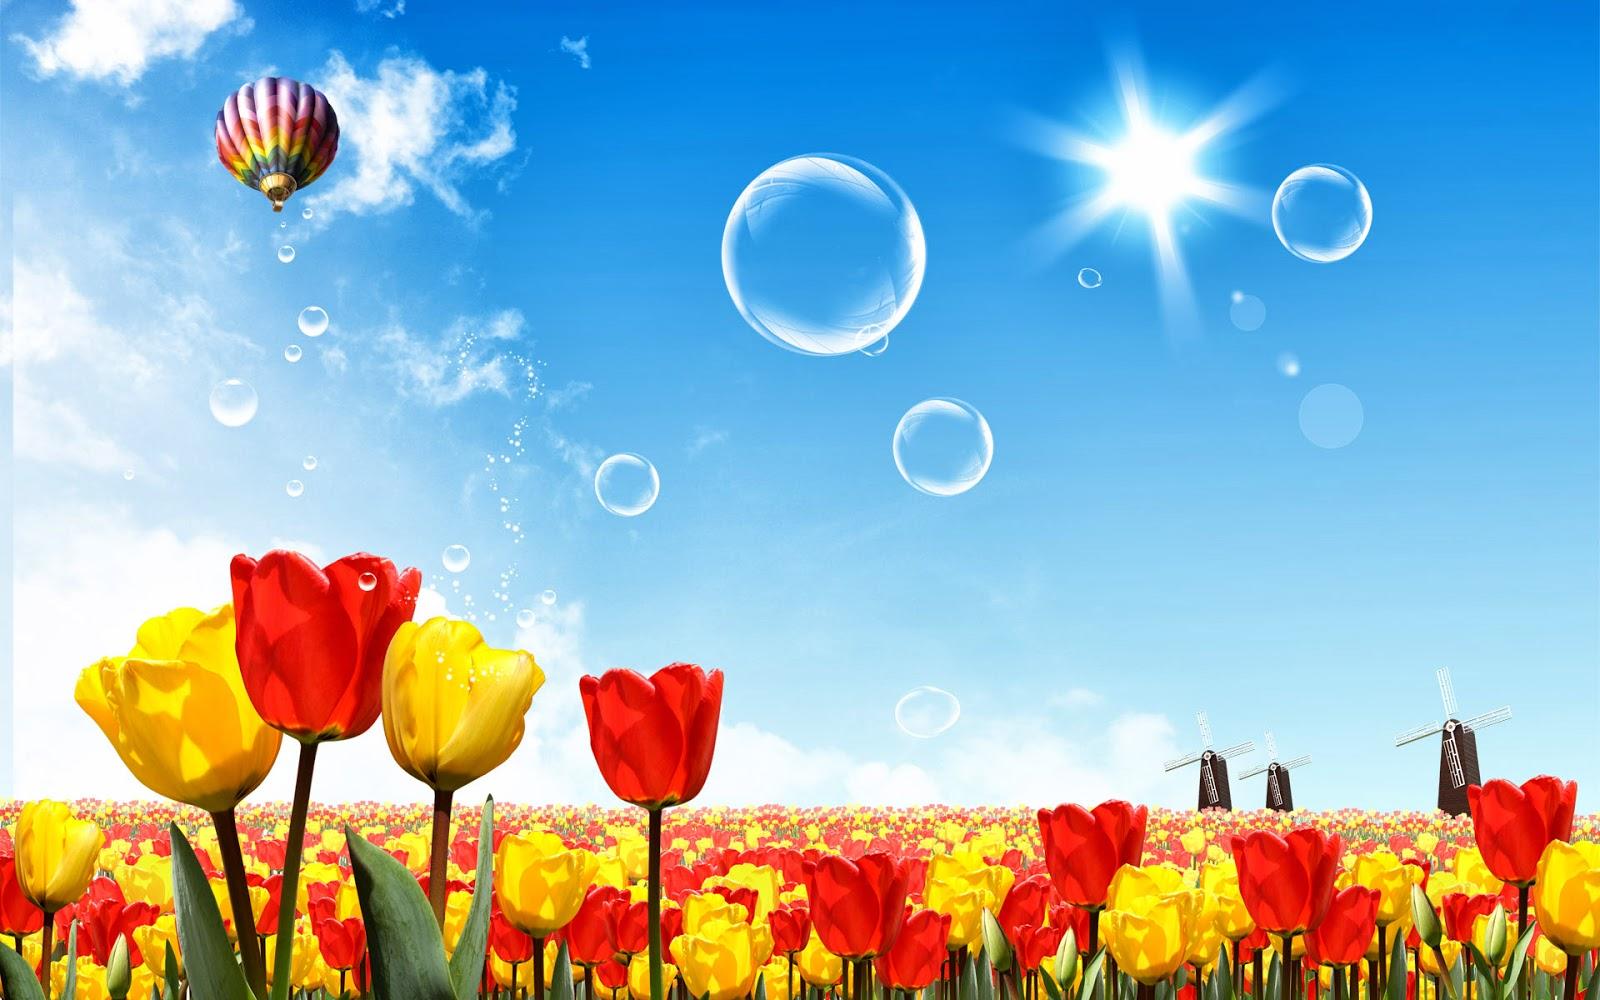 Fondos Hd Fondo De Pantalla Flores De Colores